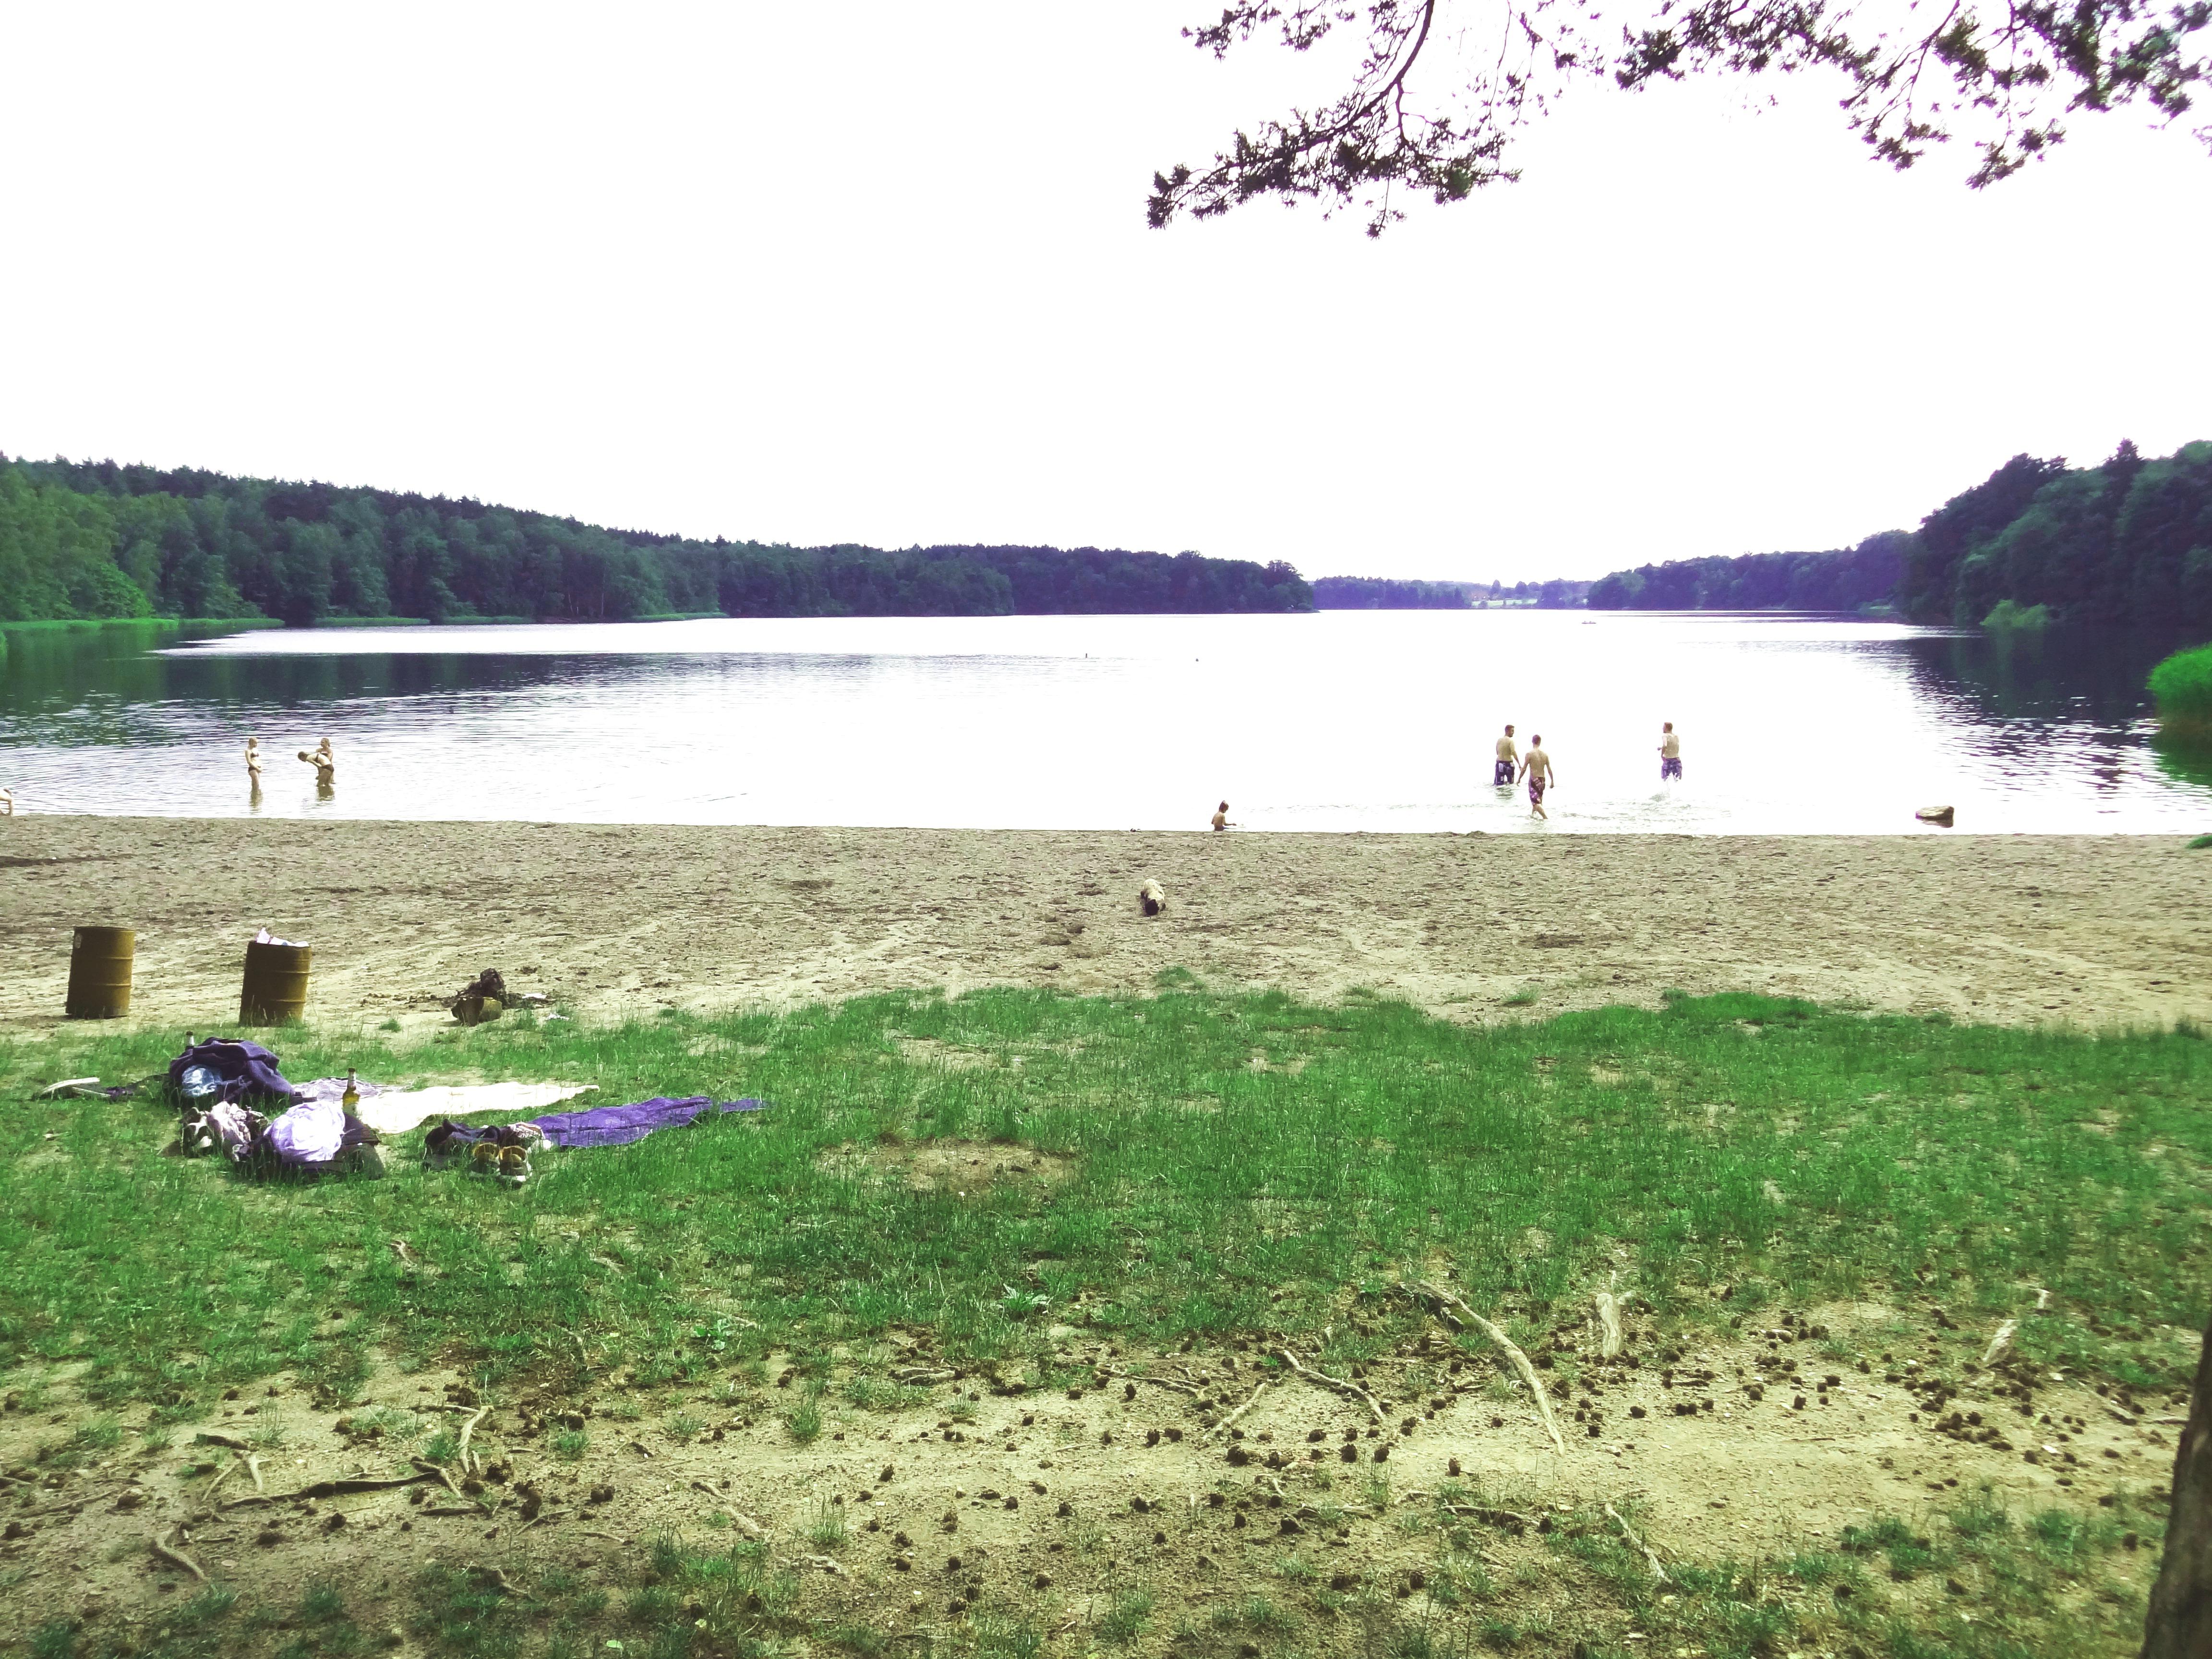 Großensee, Nordstrand, 4 km away